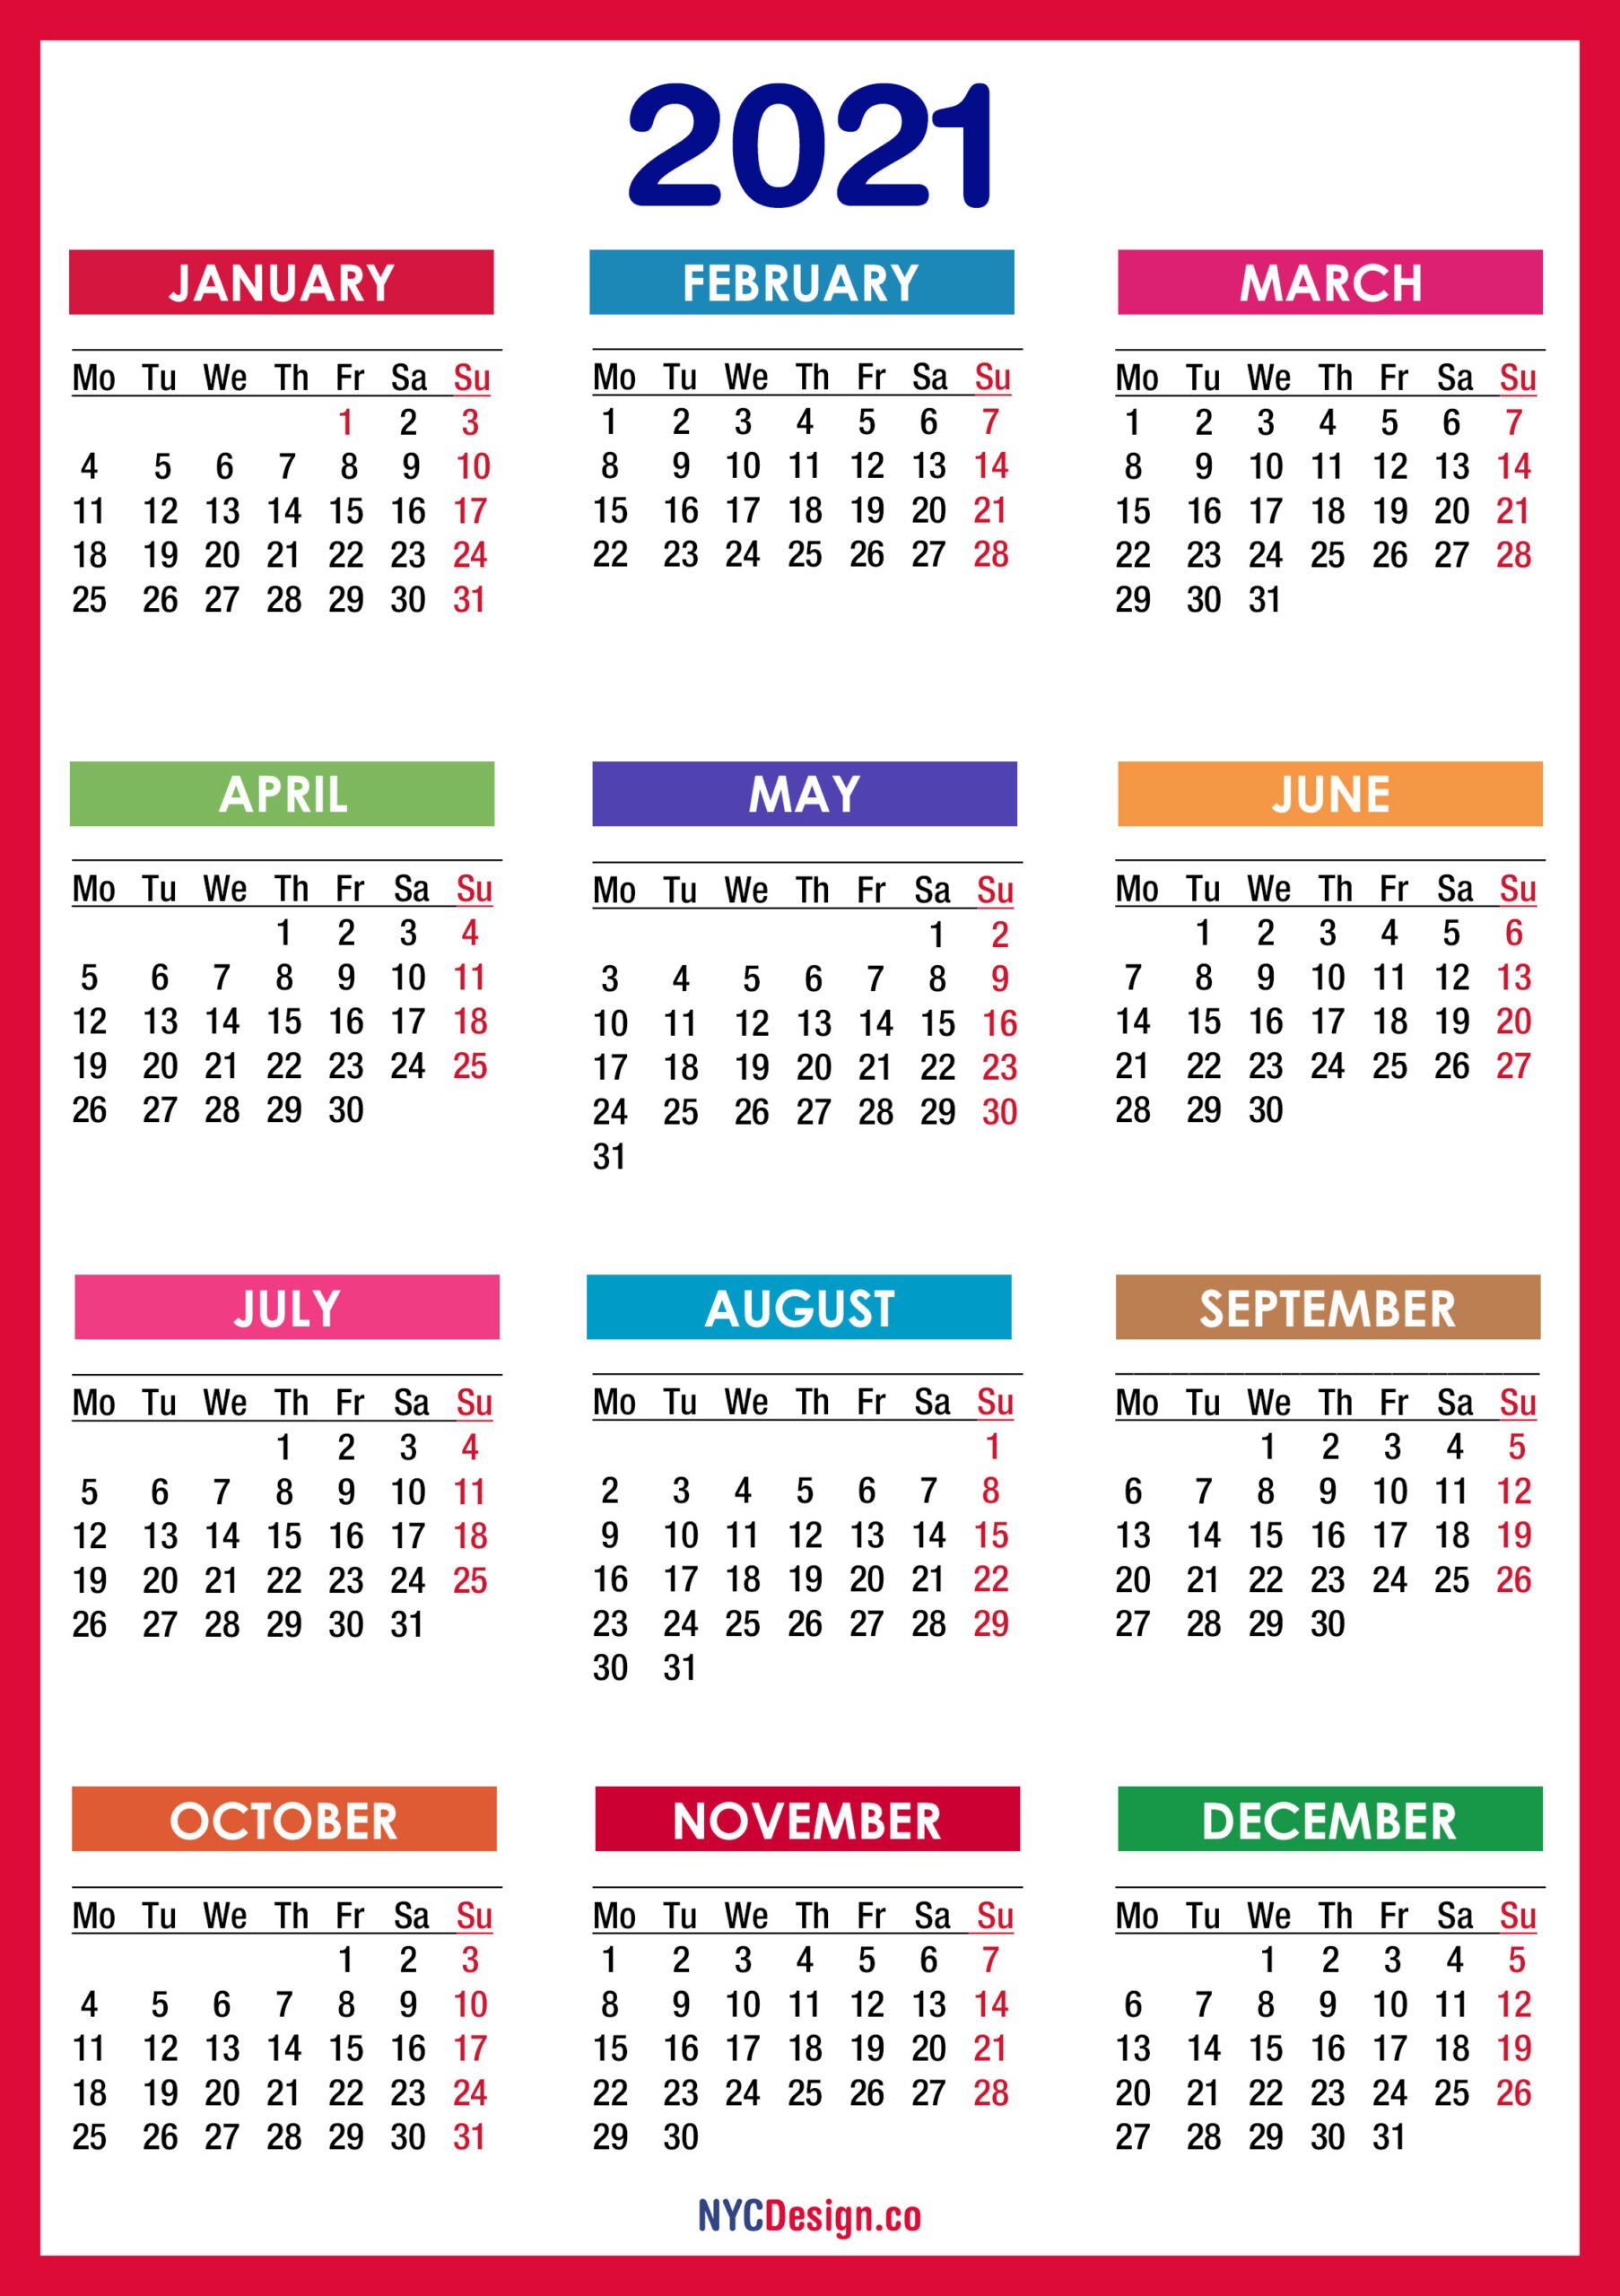 2021 Calendar Printable Free, Pdf, Colorful, Red, Orange  Easy To Print 2021 Calendar